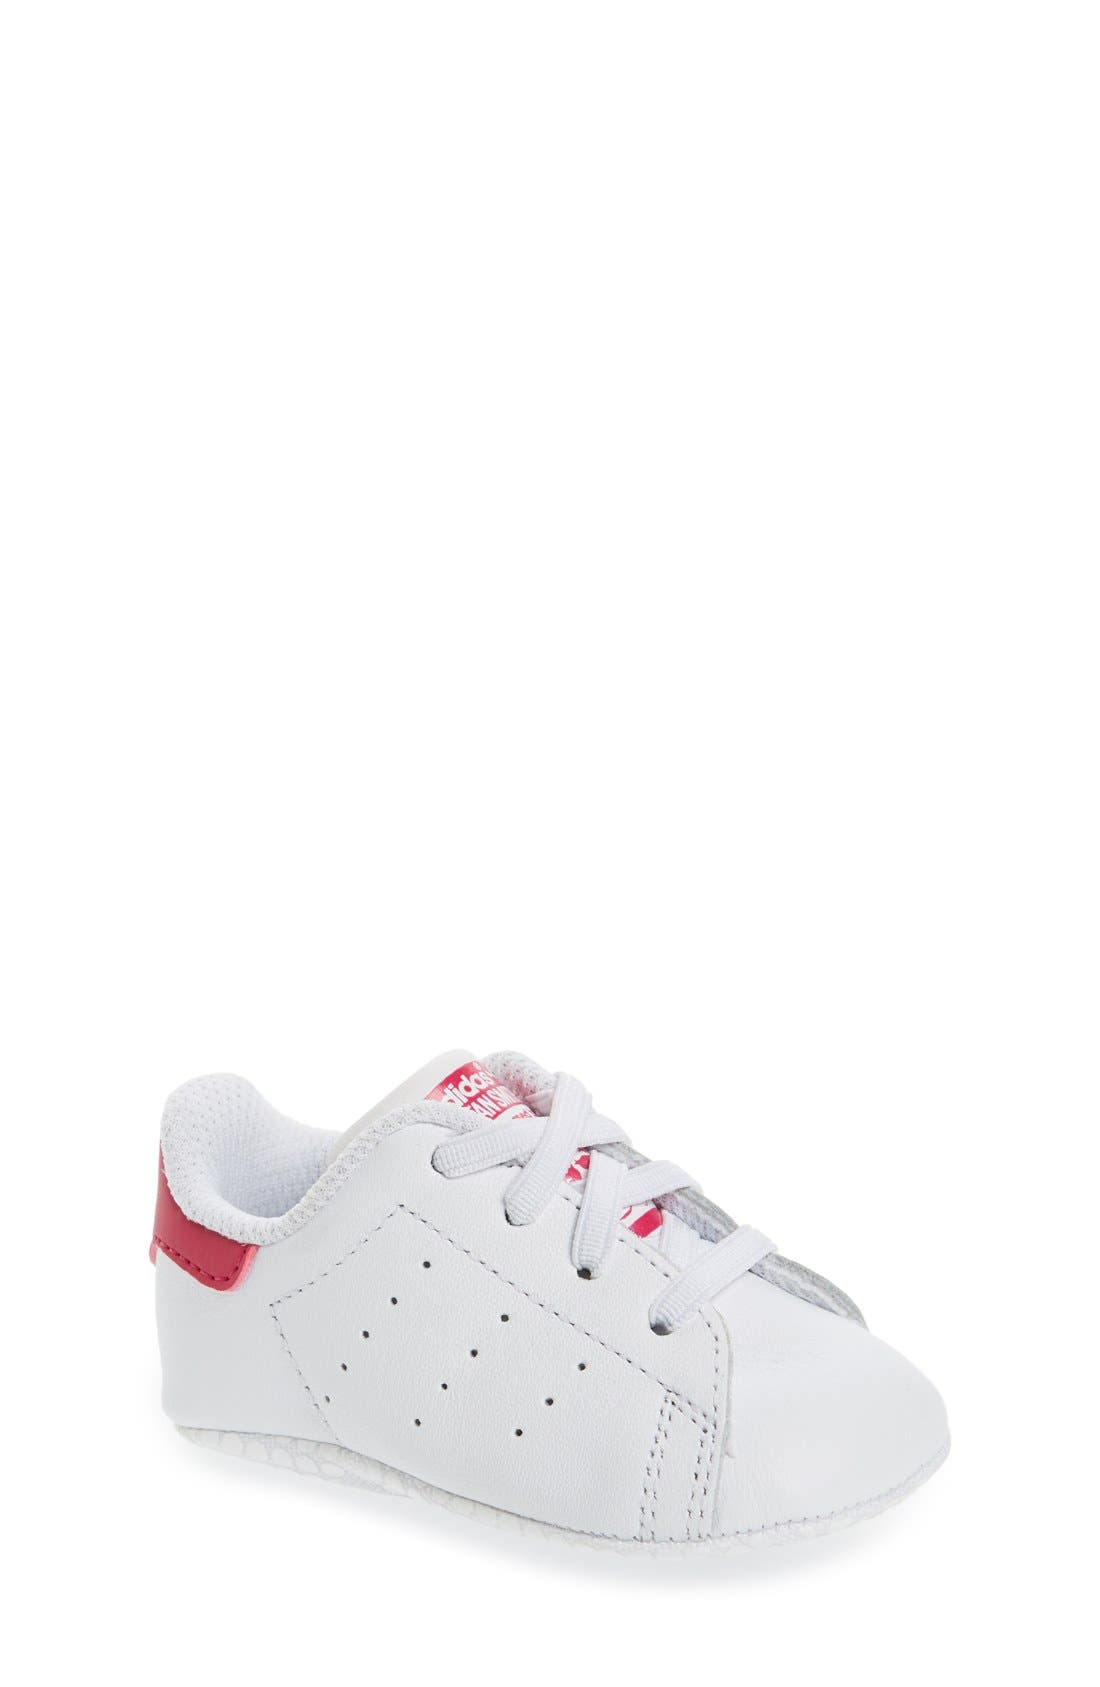 'Stan Smith' Crib Sneaker,                             Main thumbnail 1, color,                             100